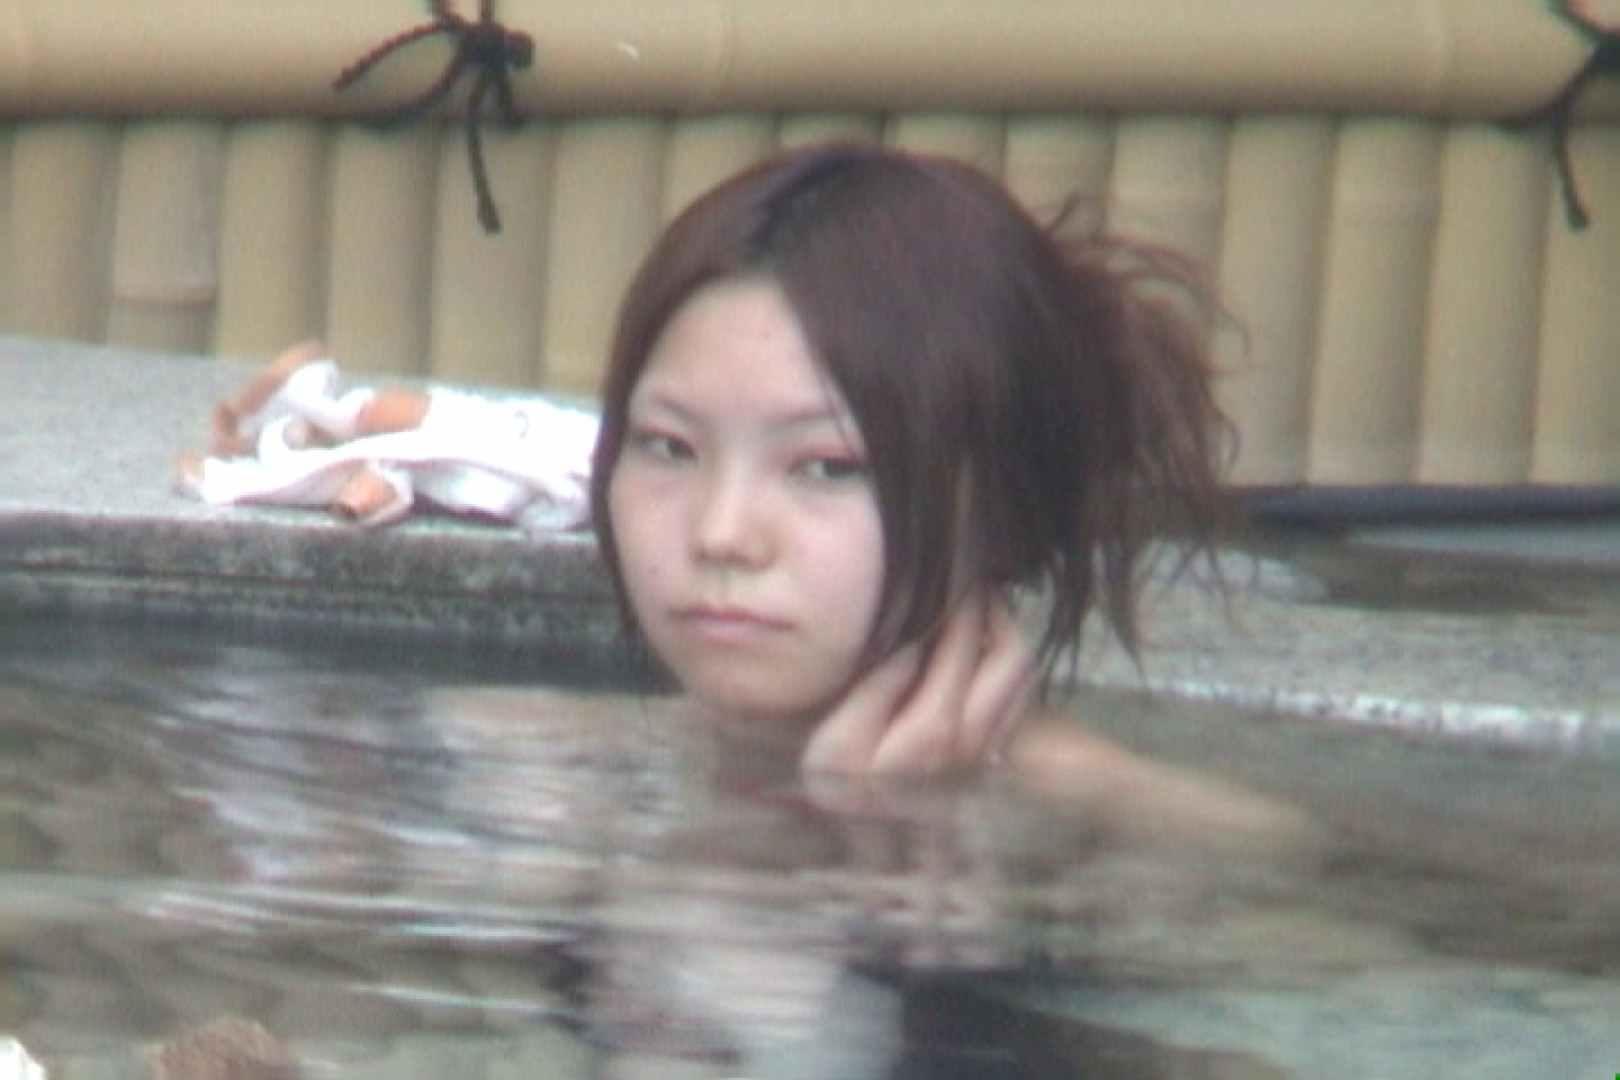 Aquaな露天風呂Vol.570 綺麗なOLたち  71枚 36